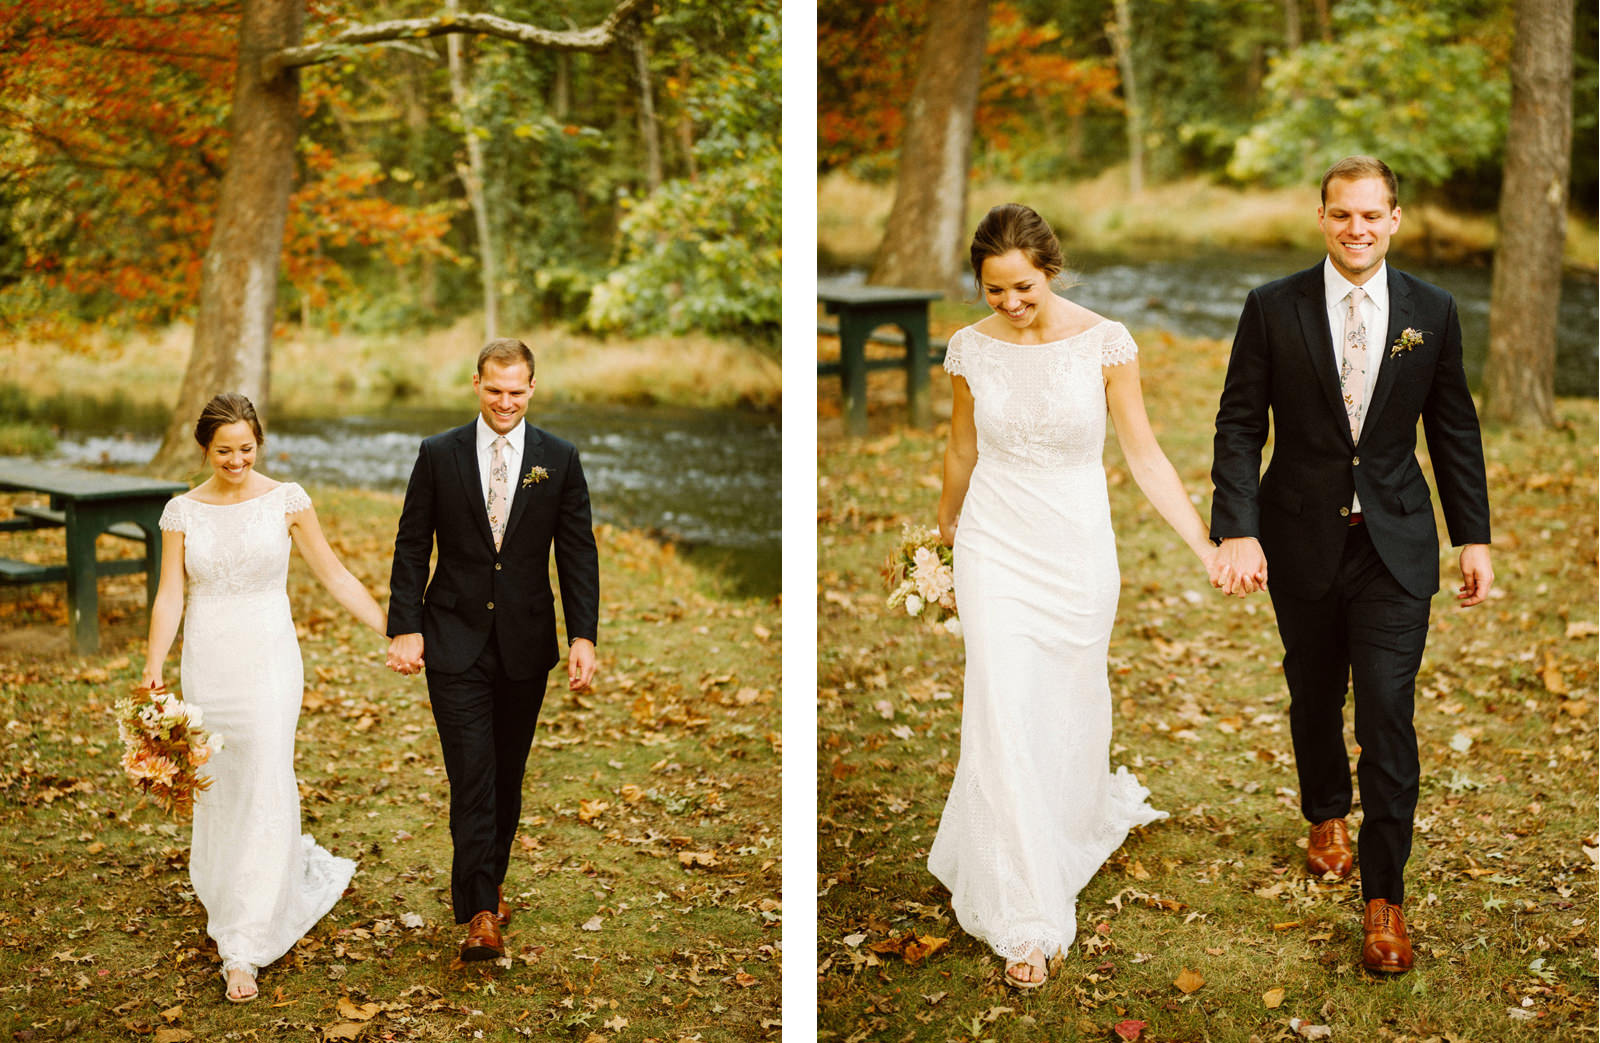 bridgeport-wedding-120 BRIDGEPORT, CONNECTICUT BACKYARD WEDDING